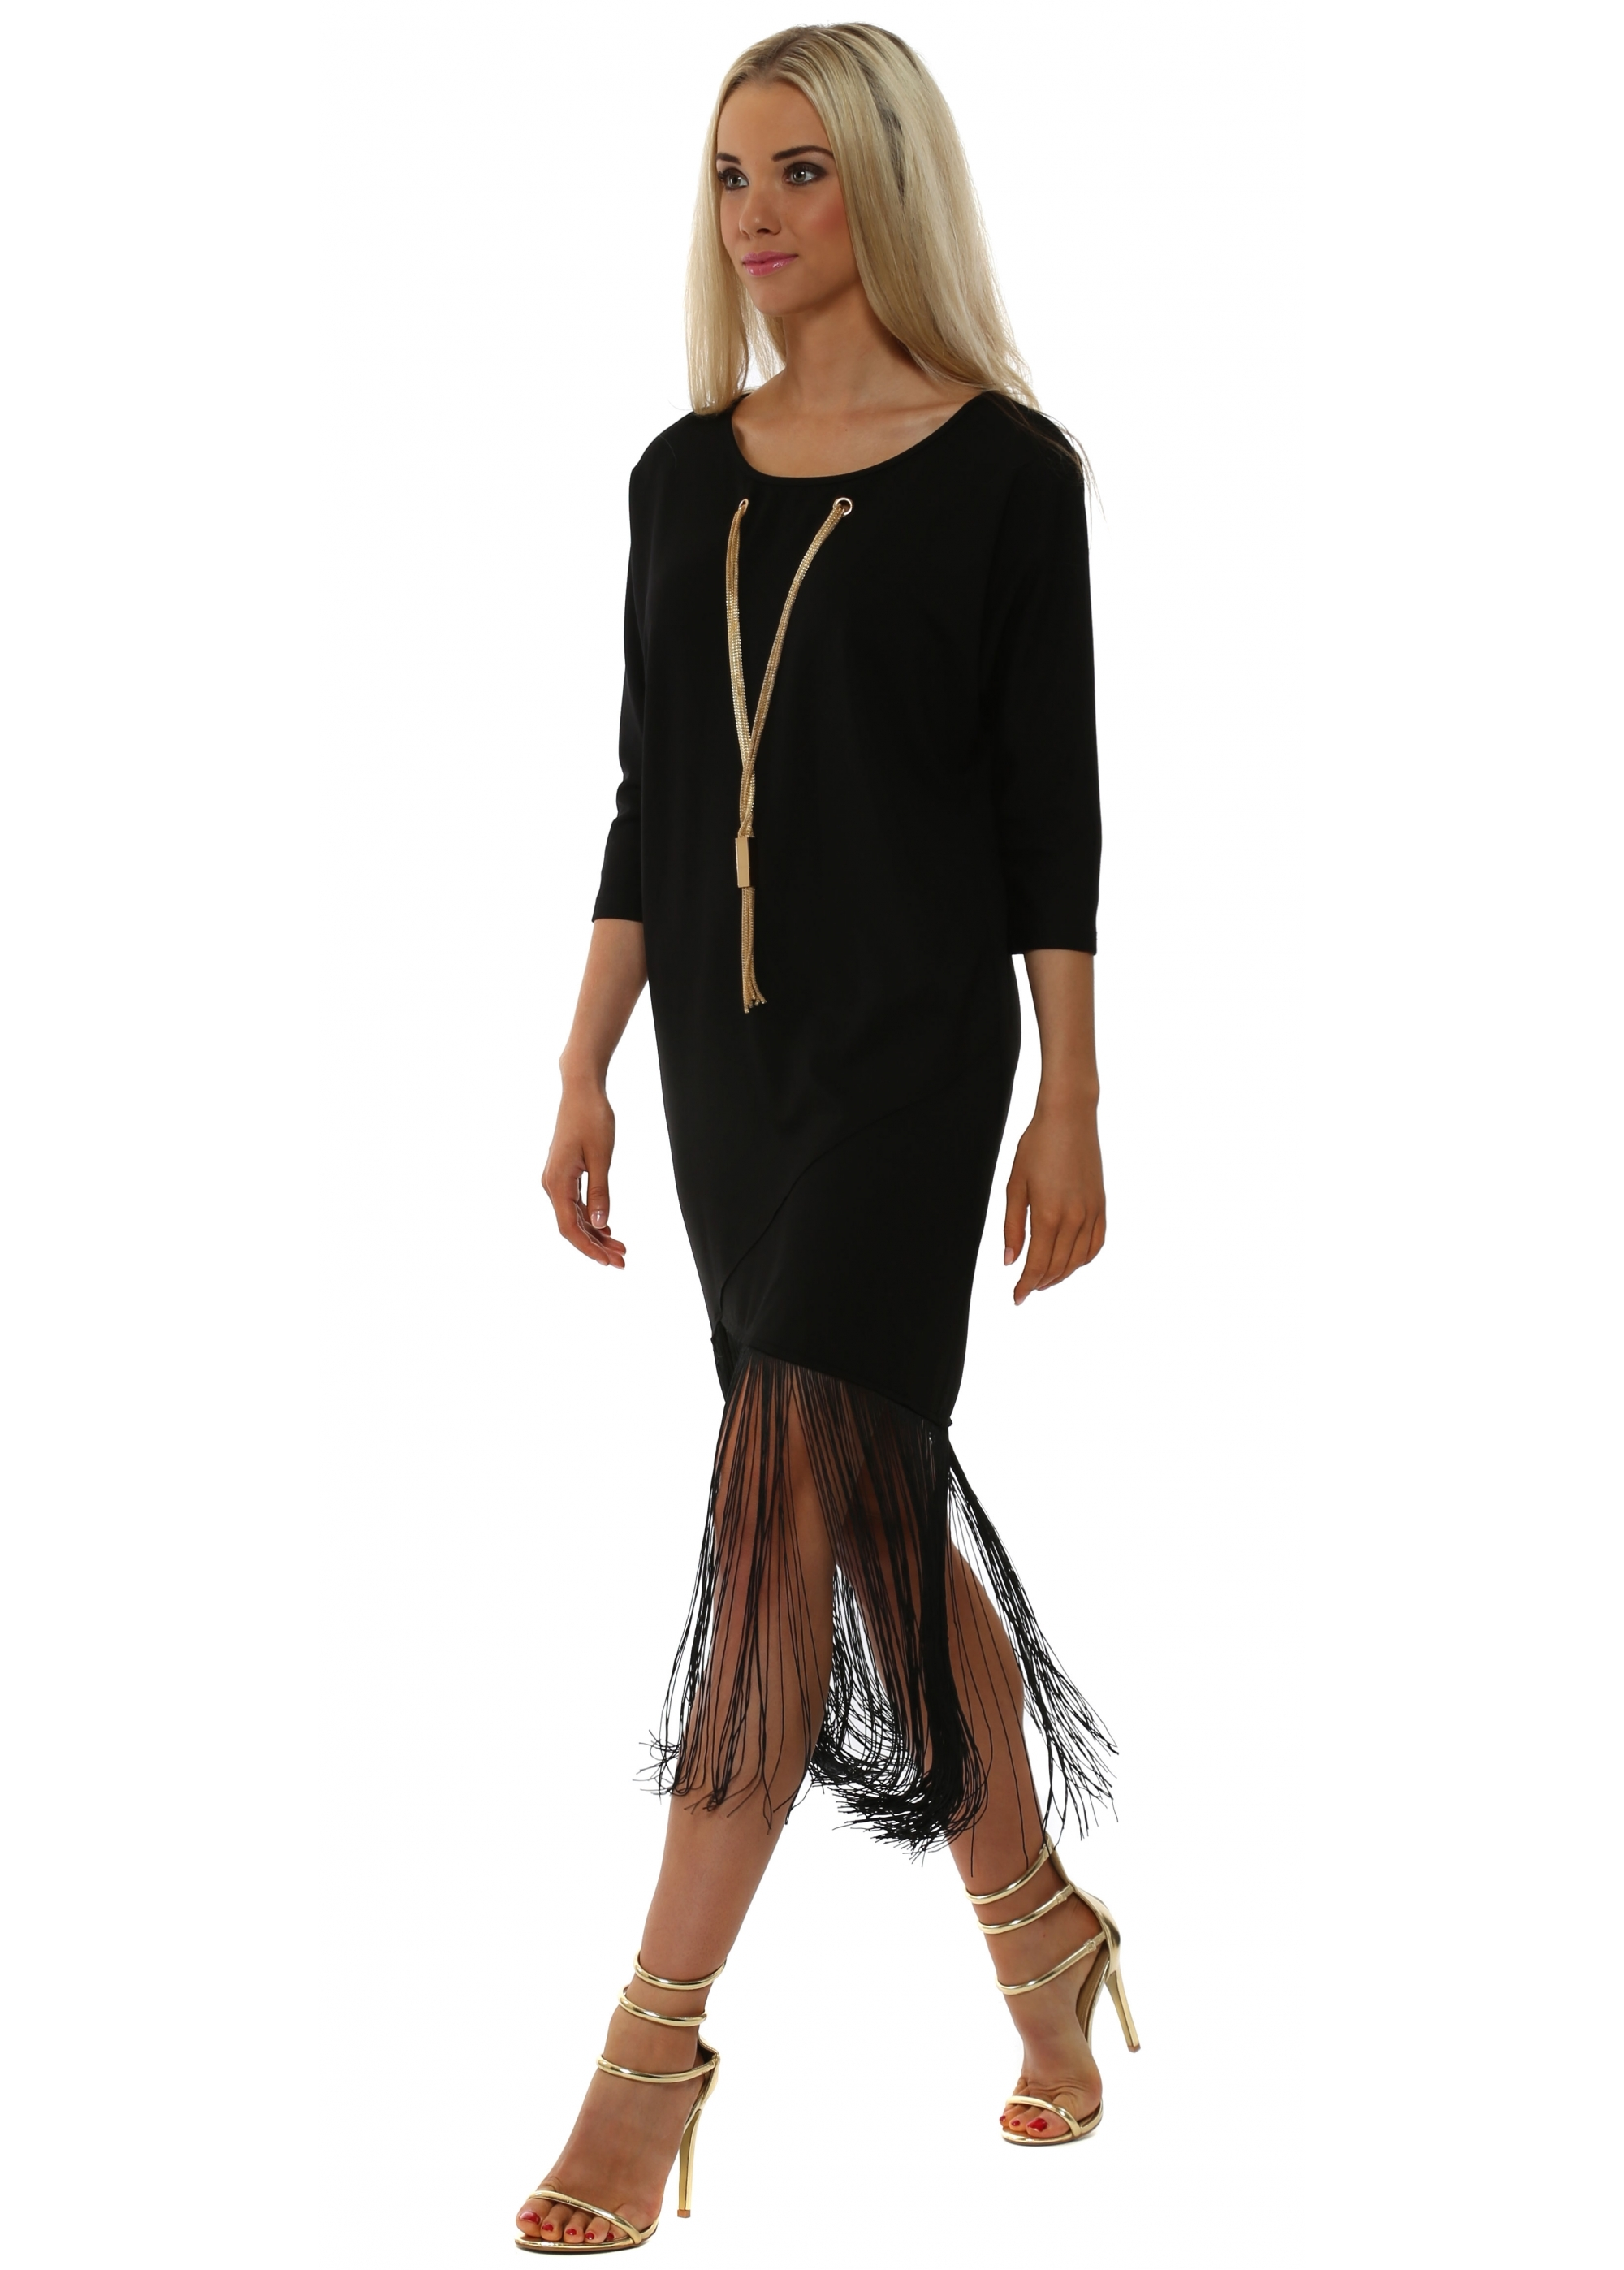 French designer black tassel dress for French couture dresses